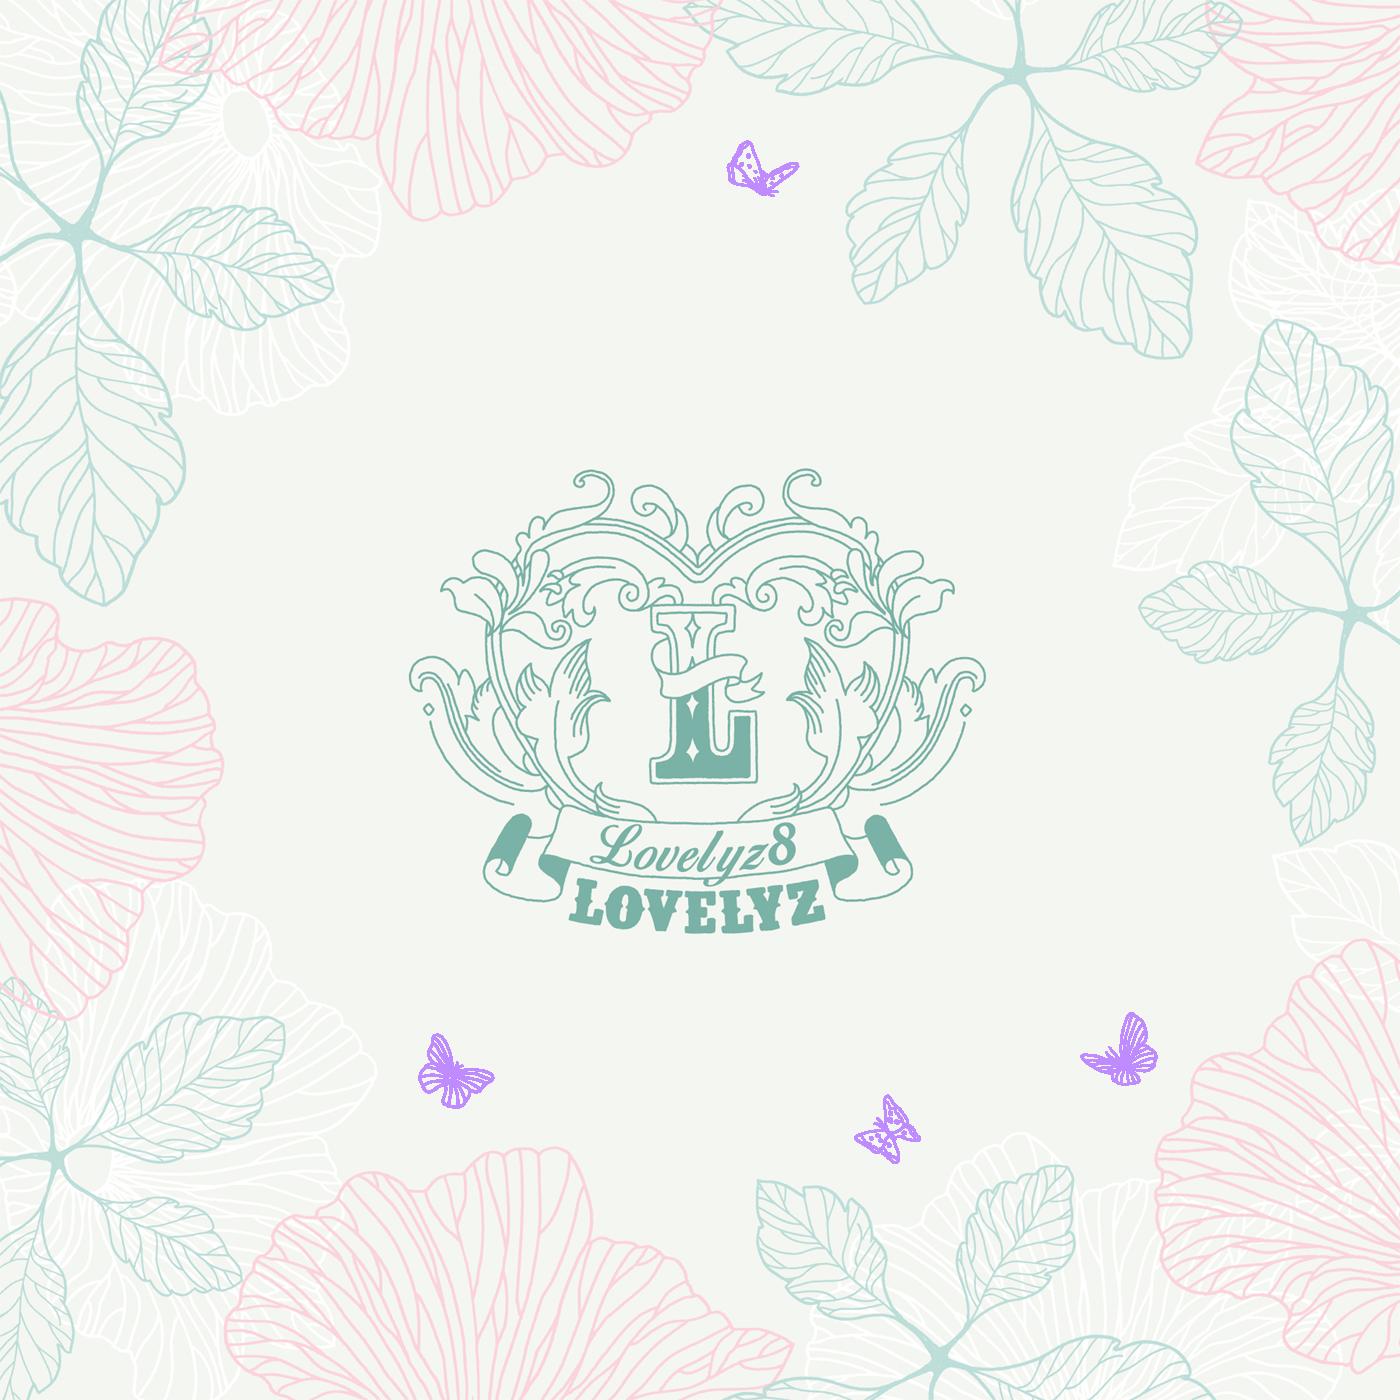 Free Download 1st Mini Album Lovelyz Lovelyz8 Mp3 Full MV Ah-Choo